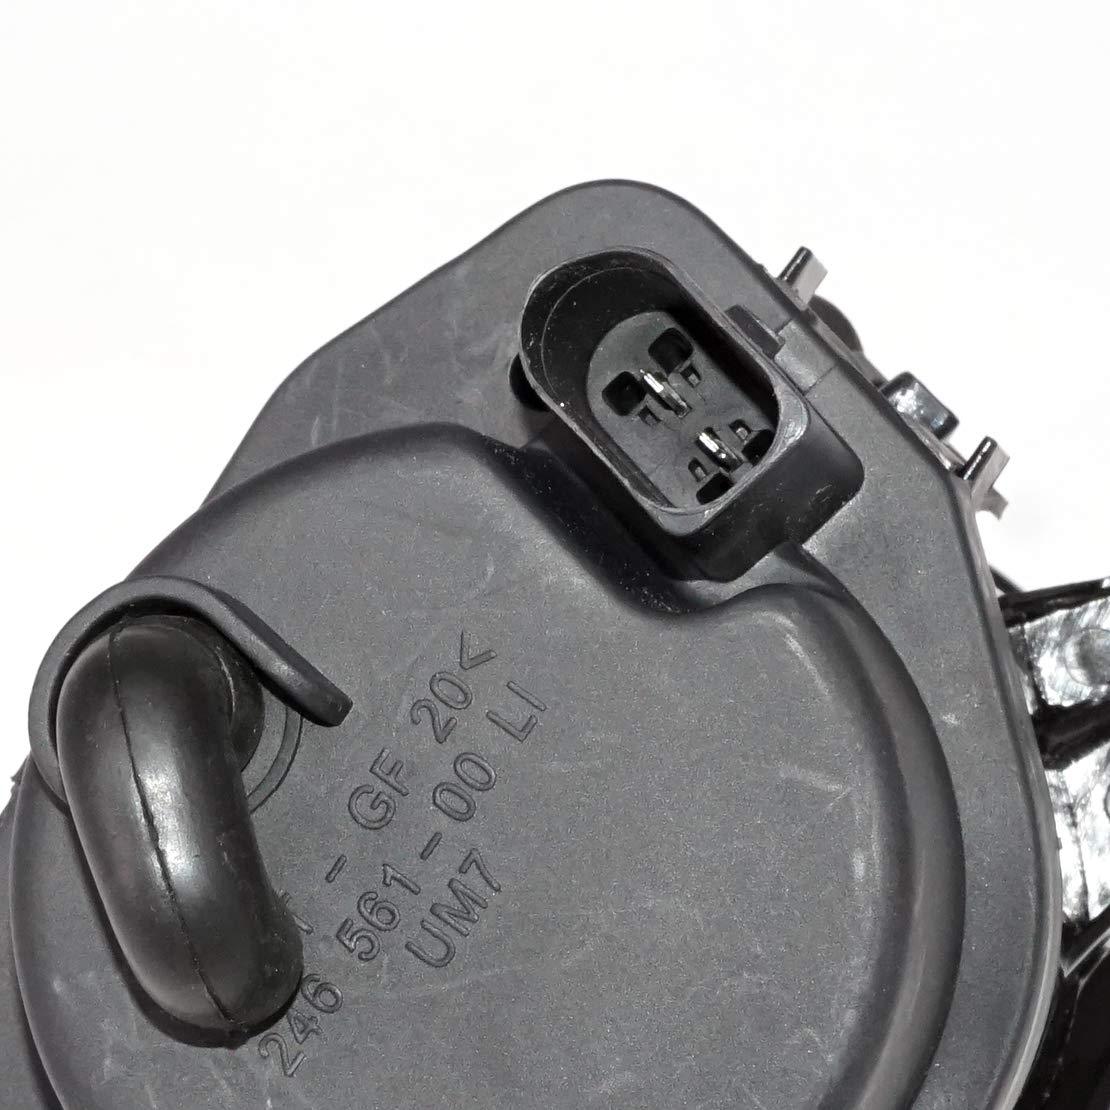 LETAOSK 1 Paire Phares antibrouillard Avant /à halog/ène pour phares antibrouillards pour Audi A6 C5 2003-2004